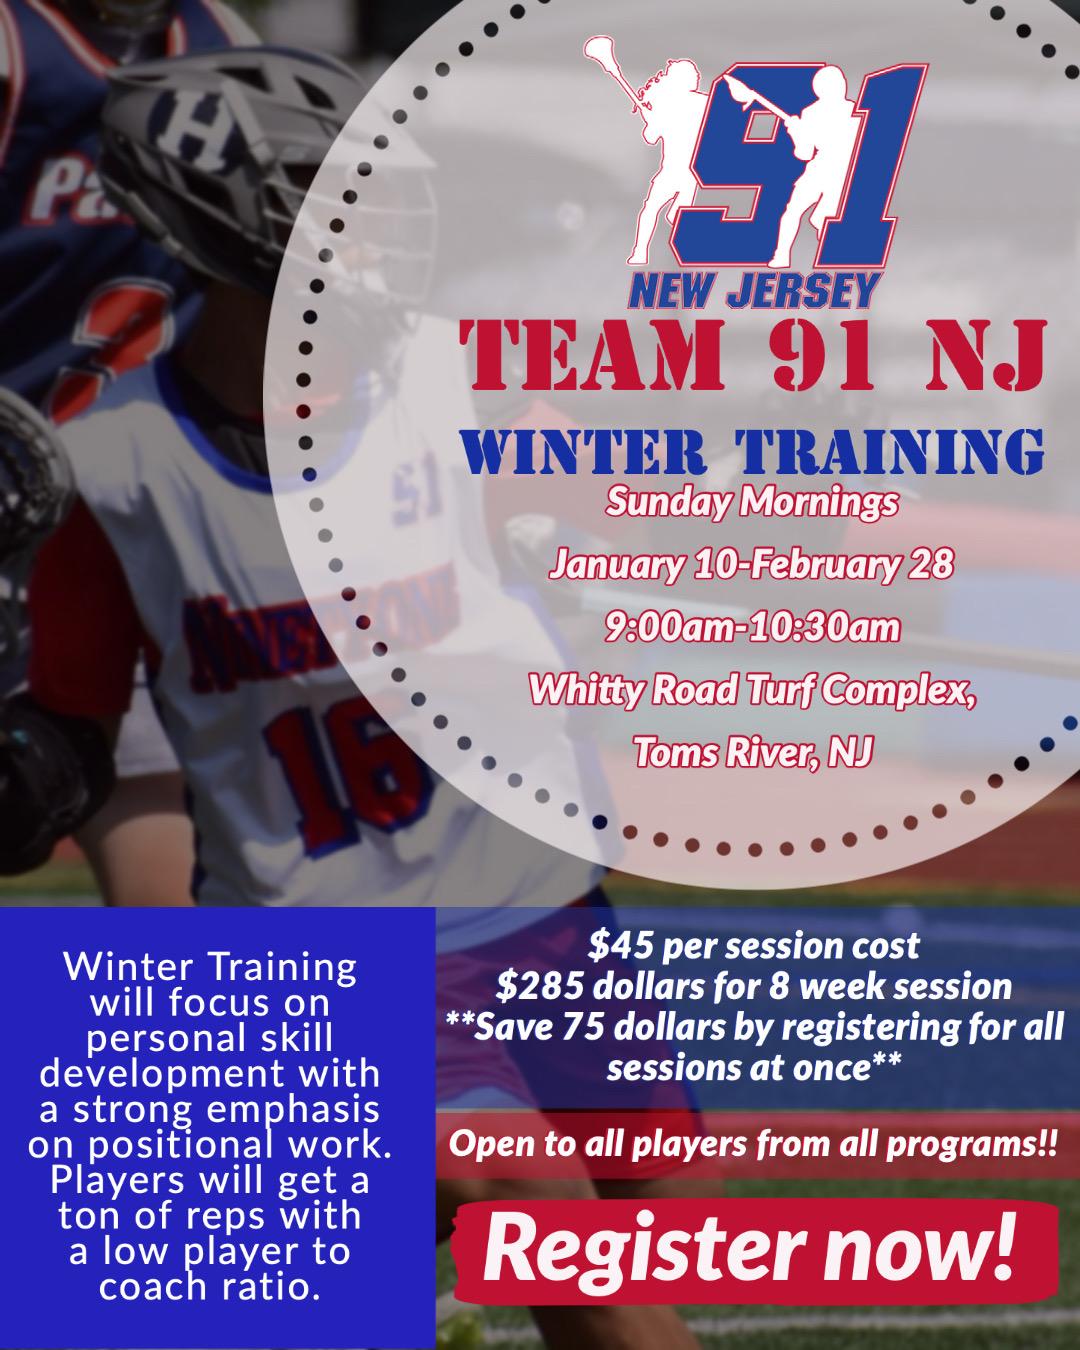 Team 91 NJ Winter Training-5